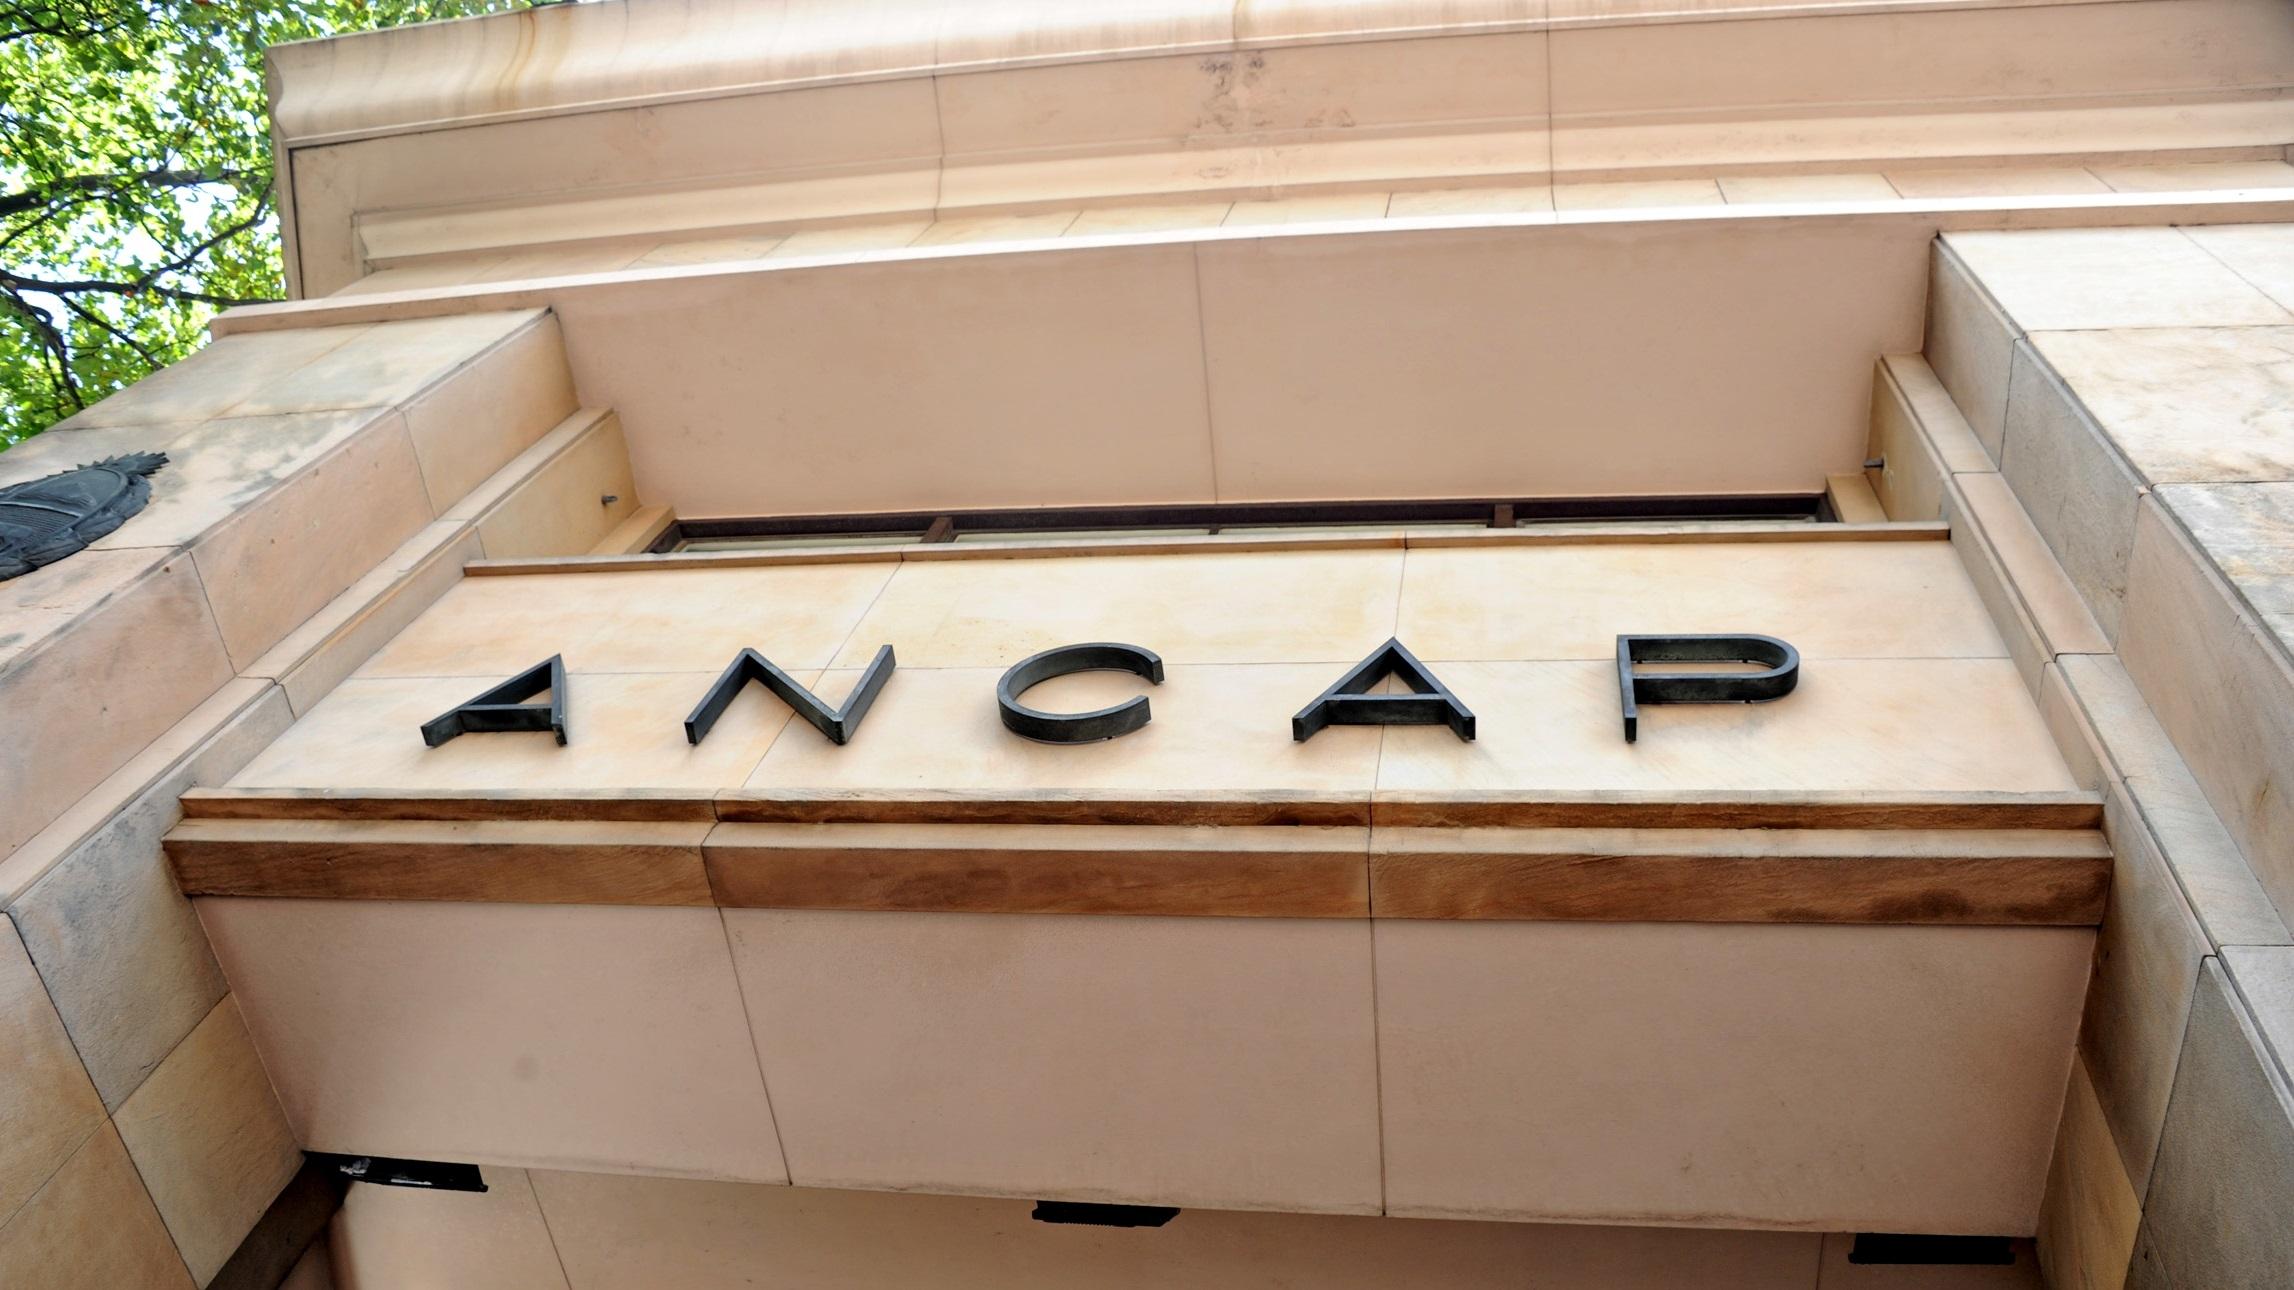 Ancap tuvo un superávit de US$ 39 millones en 2017